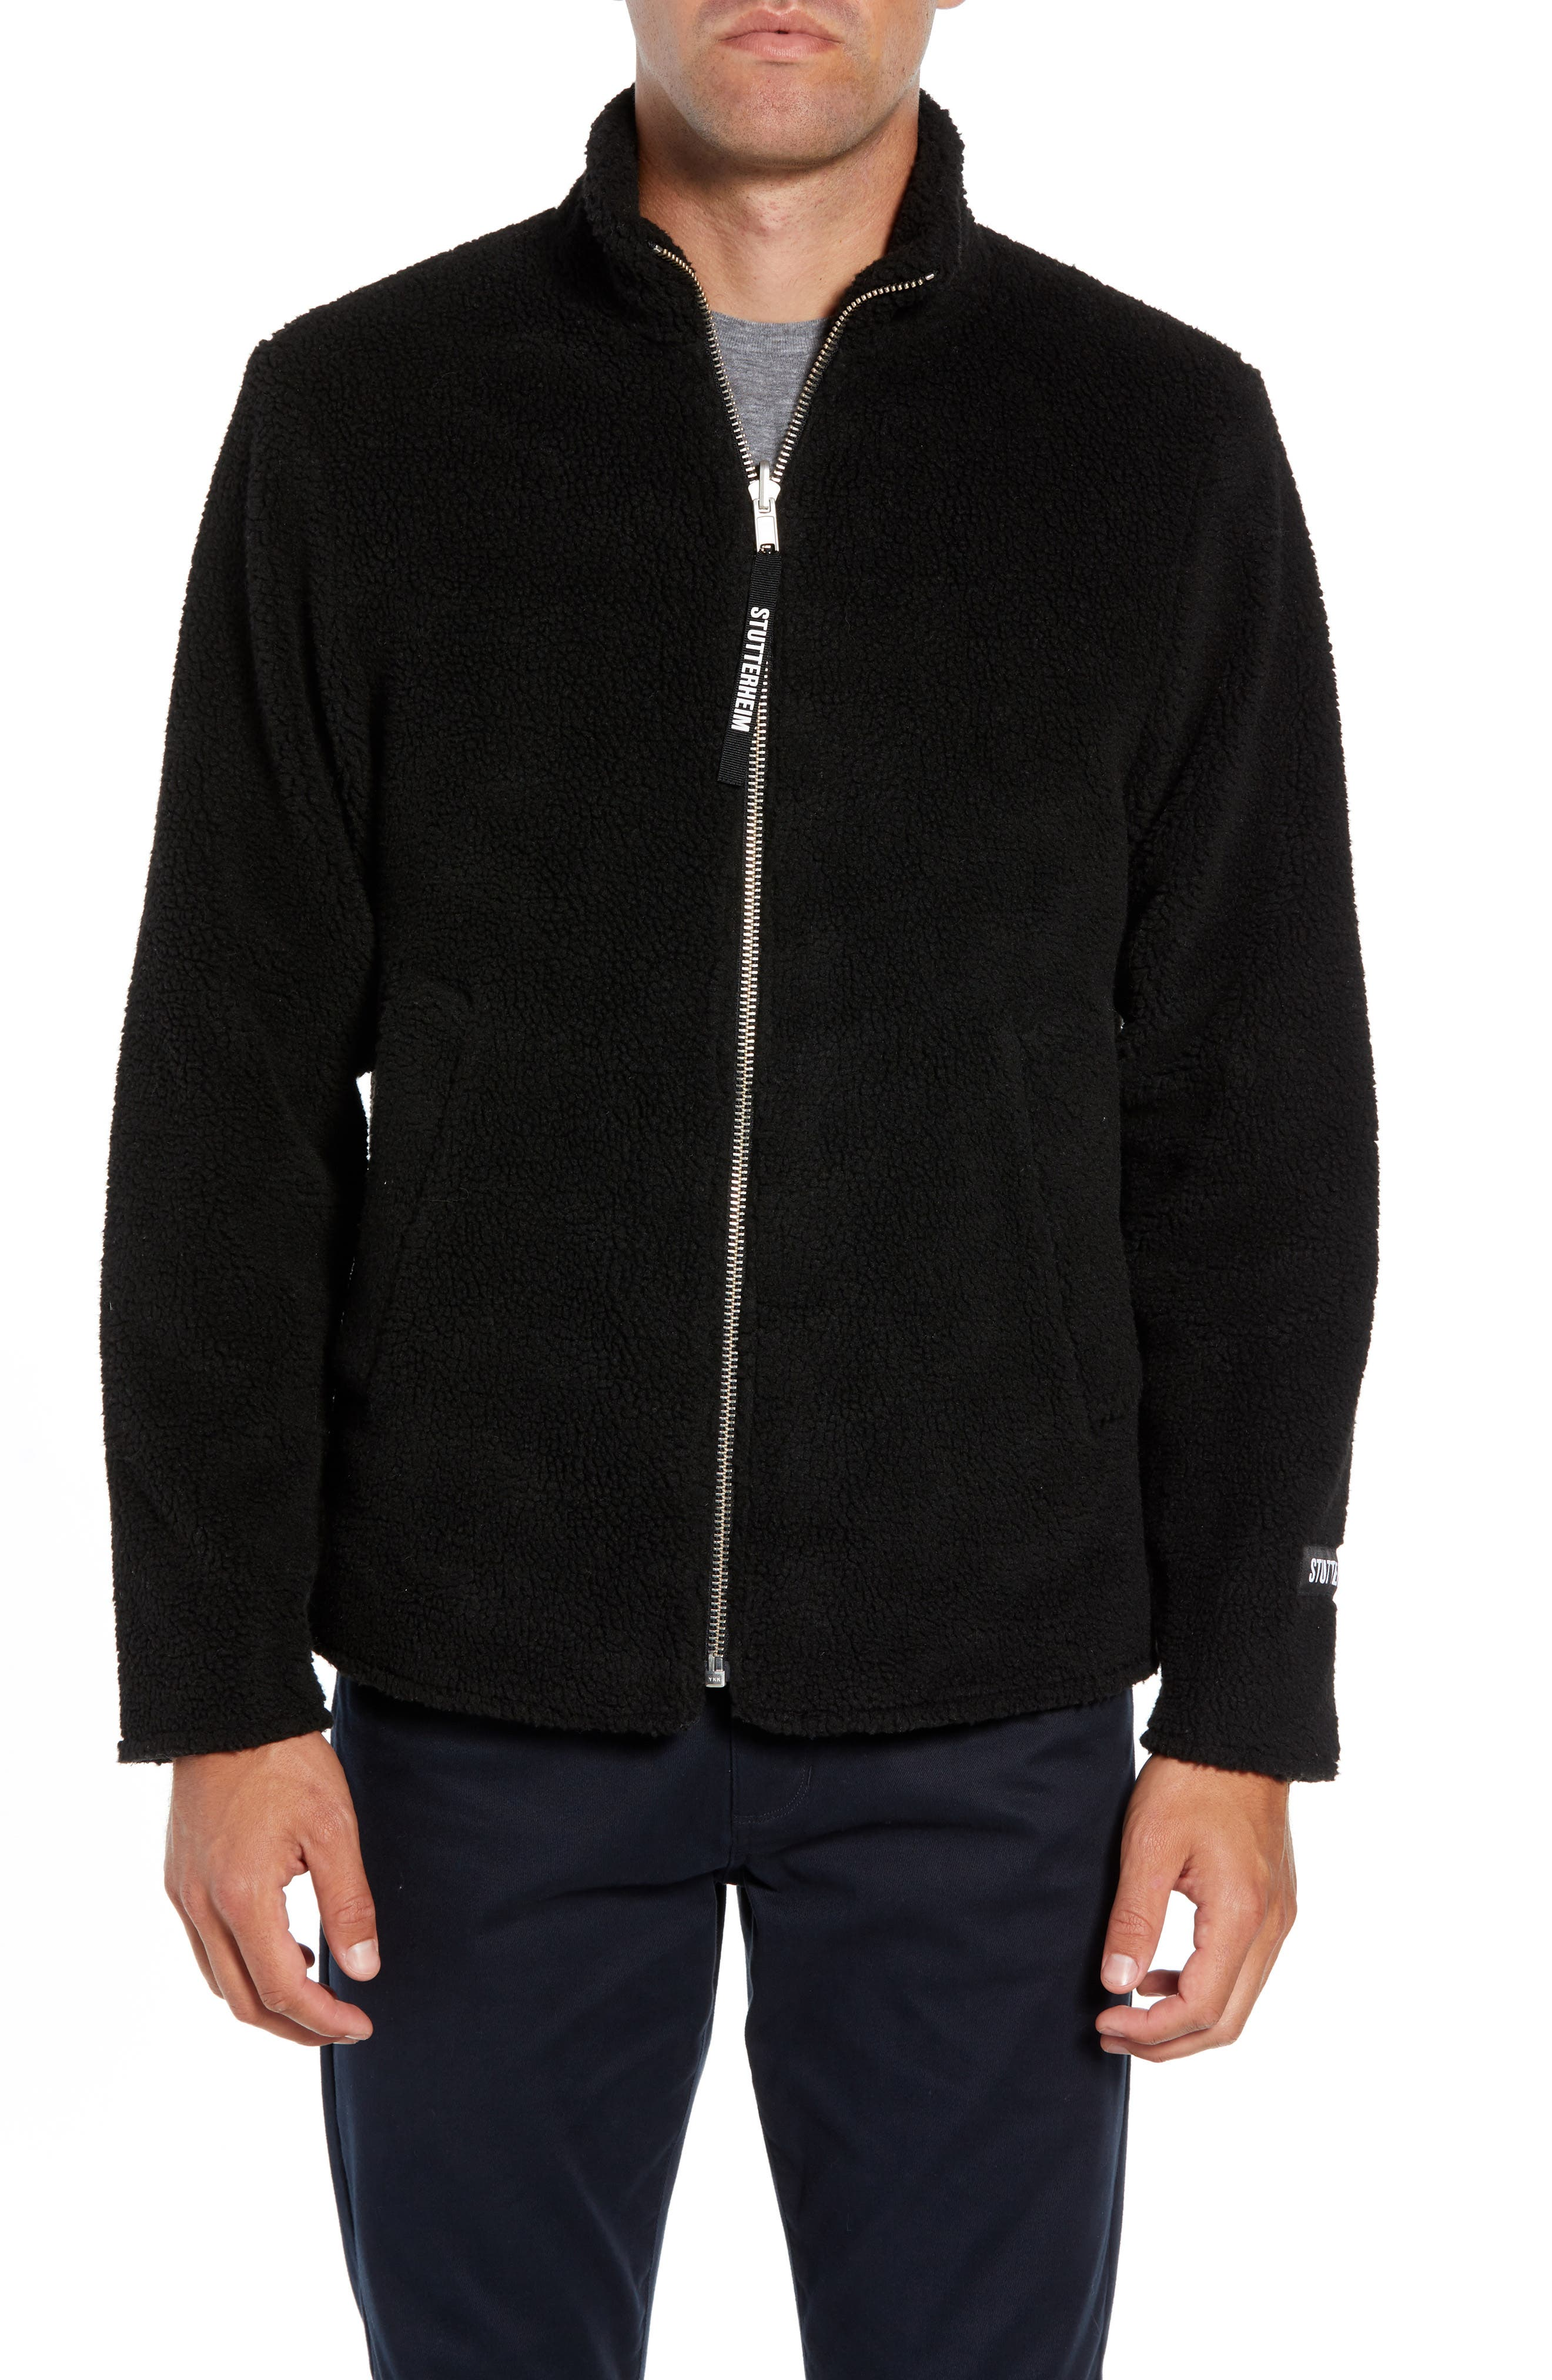 Varby Reversible Fleece Jacket,                             Alternate thumbnail 6, color,                             BLACK